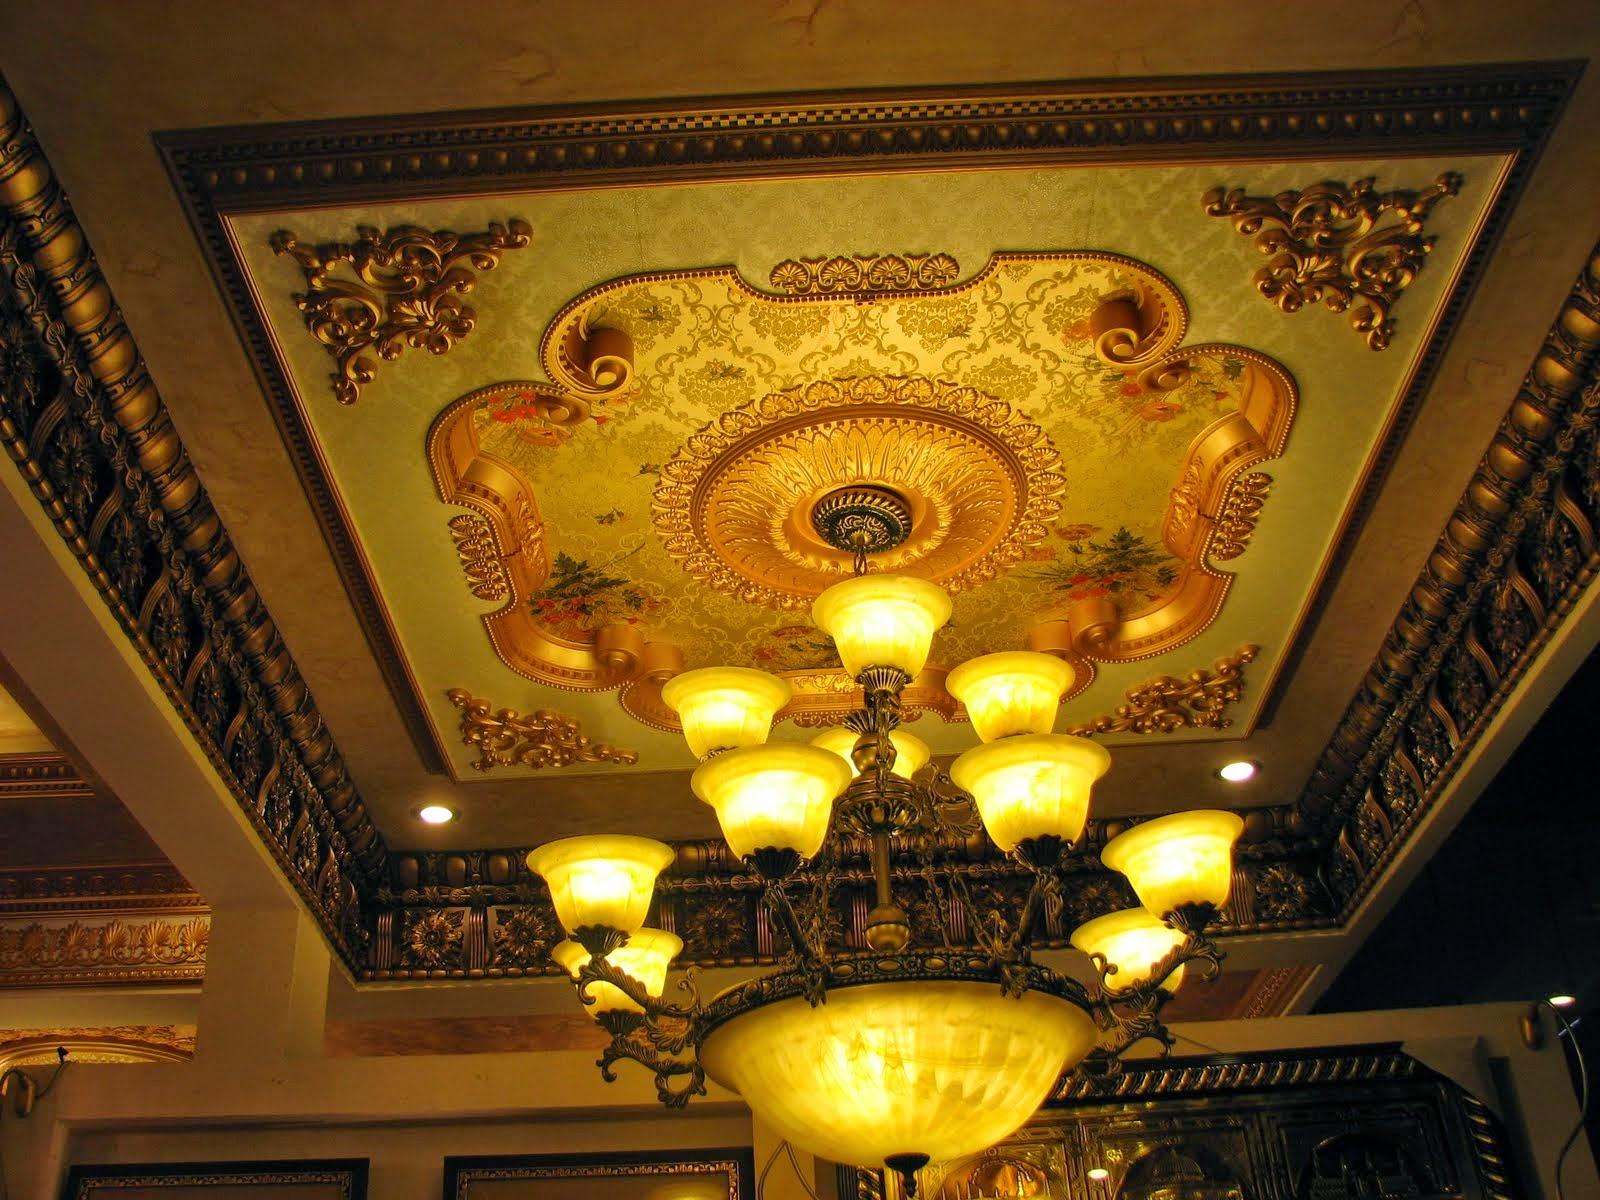 Arsitektur Plafon Rumah Klasik